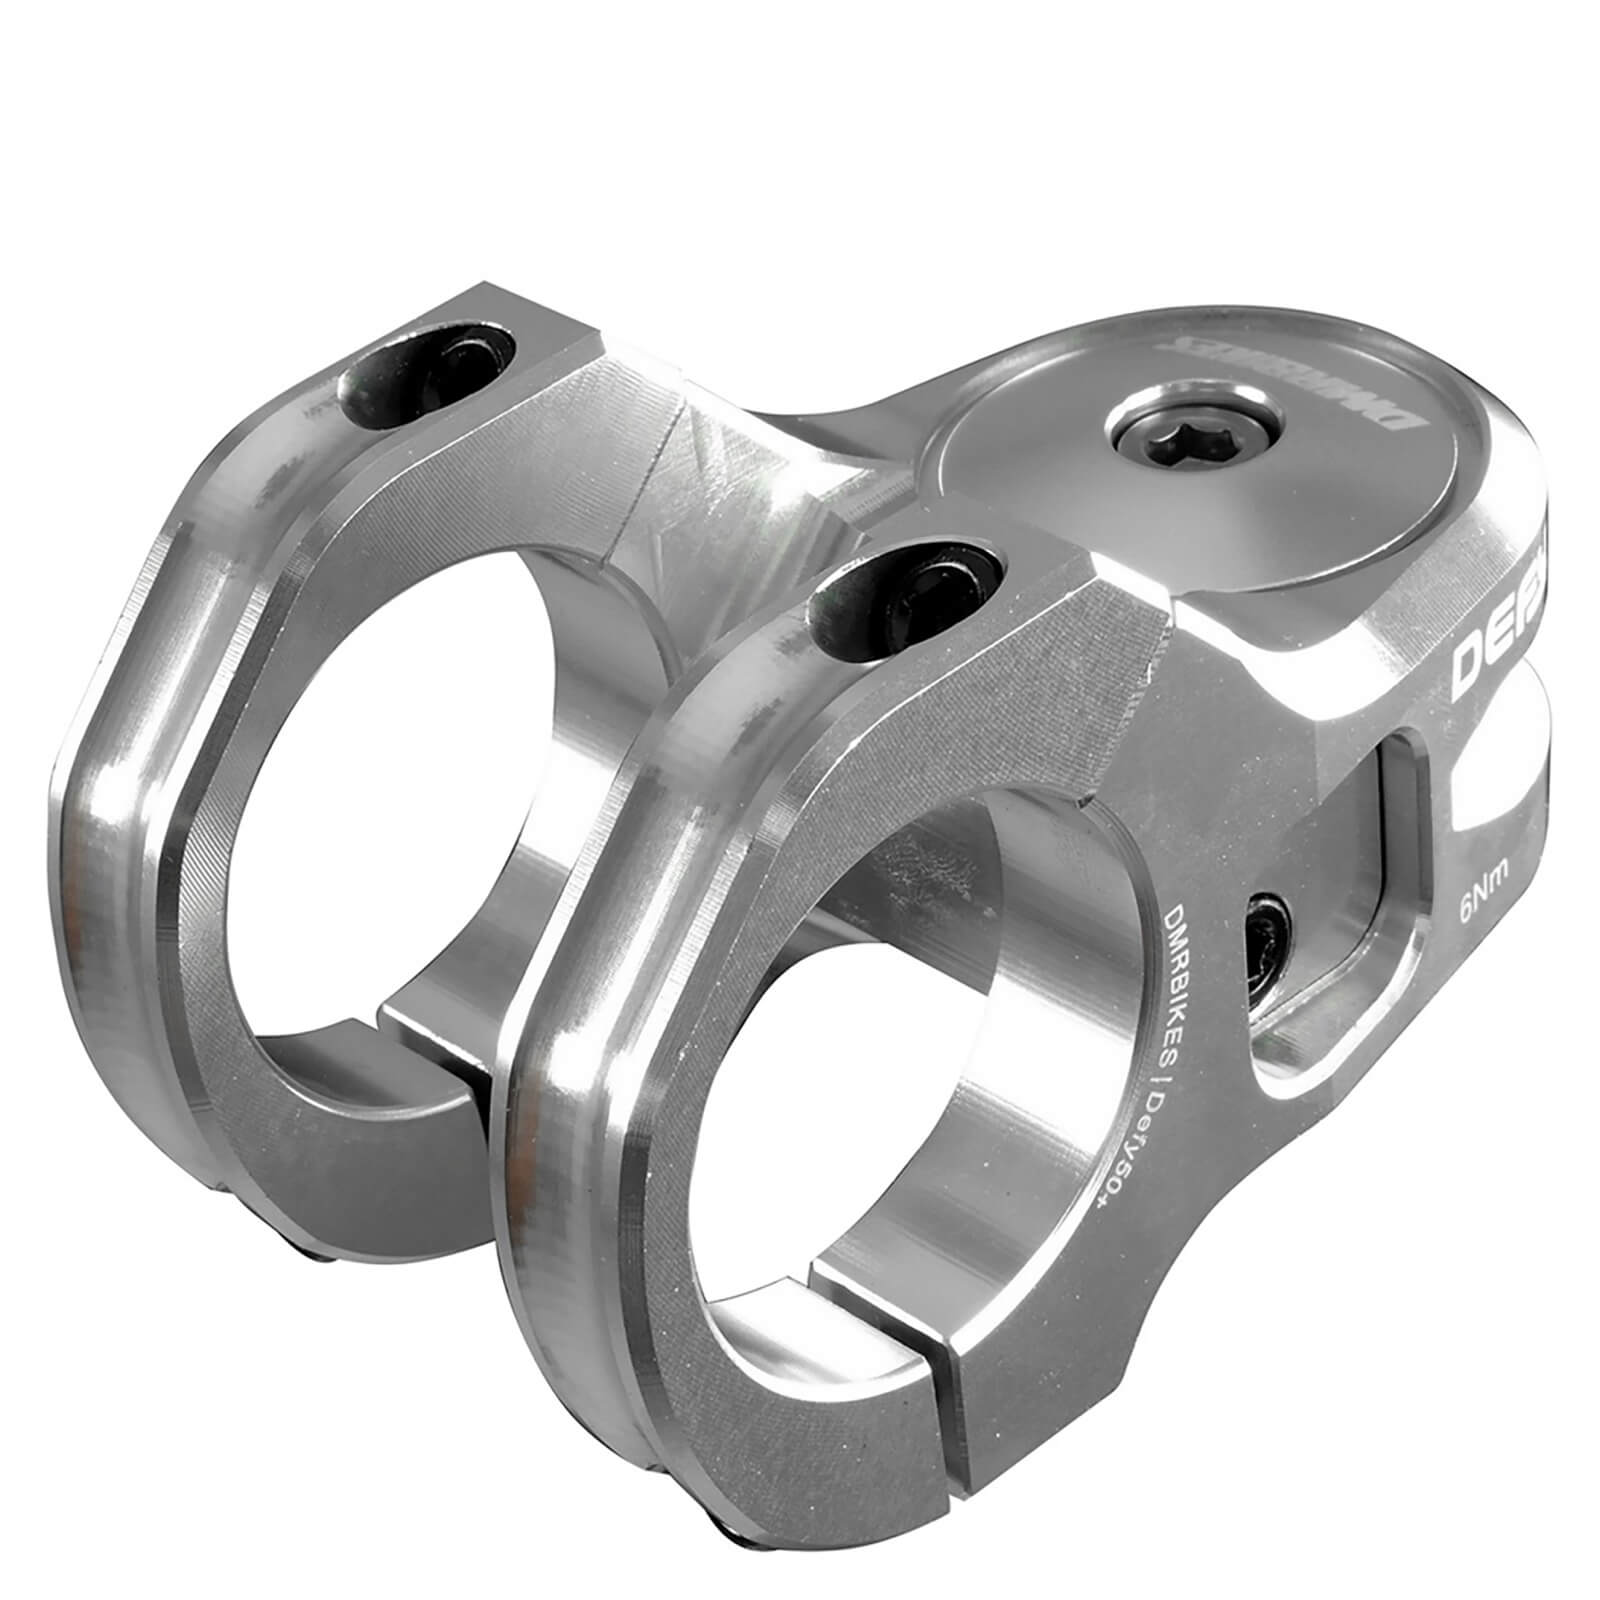 DMR Defy 50 Stem - 31.8mm Clamp - Silver